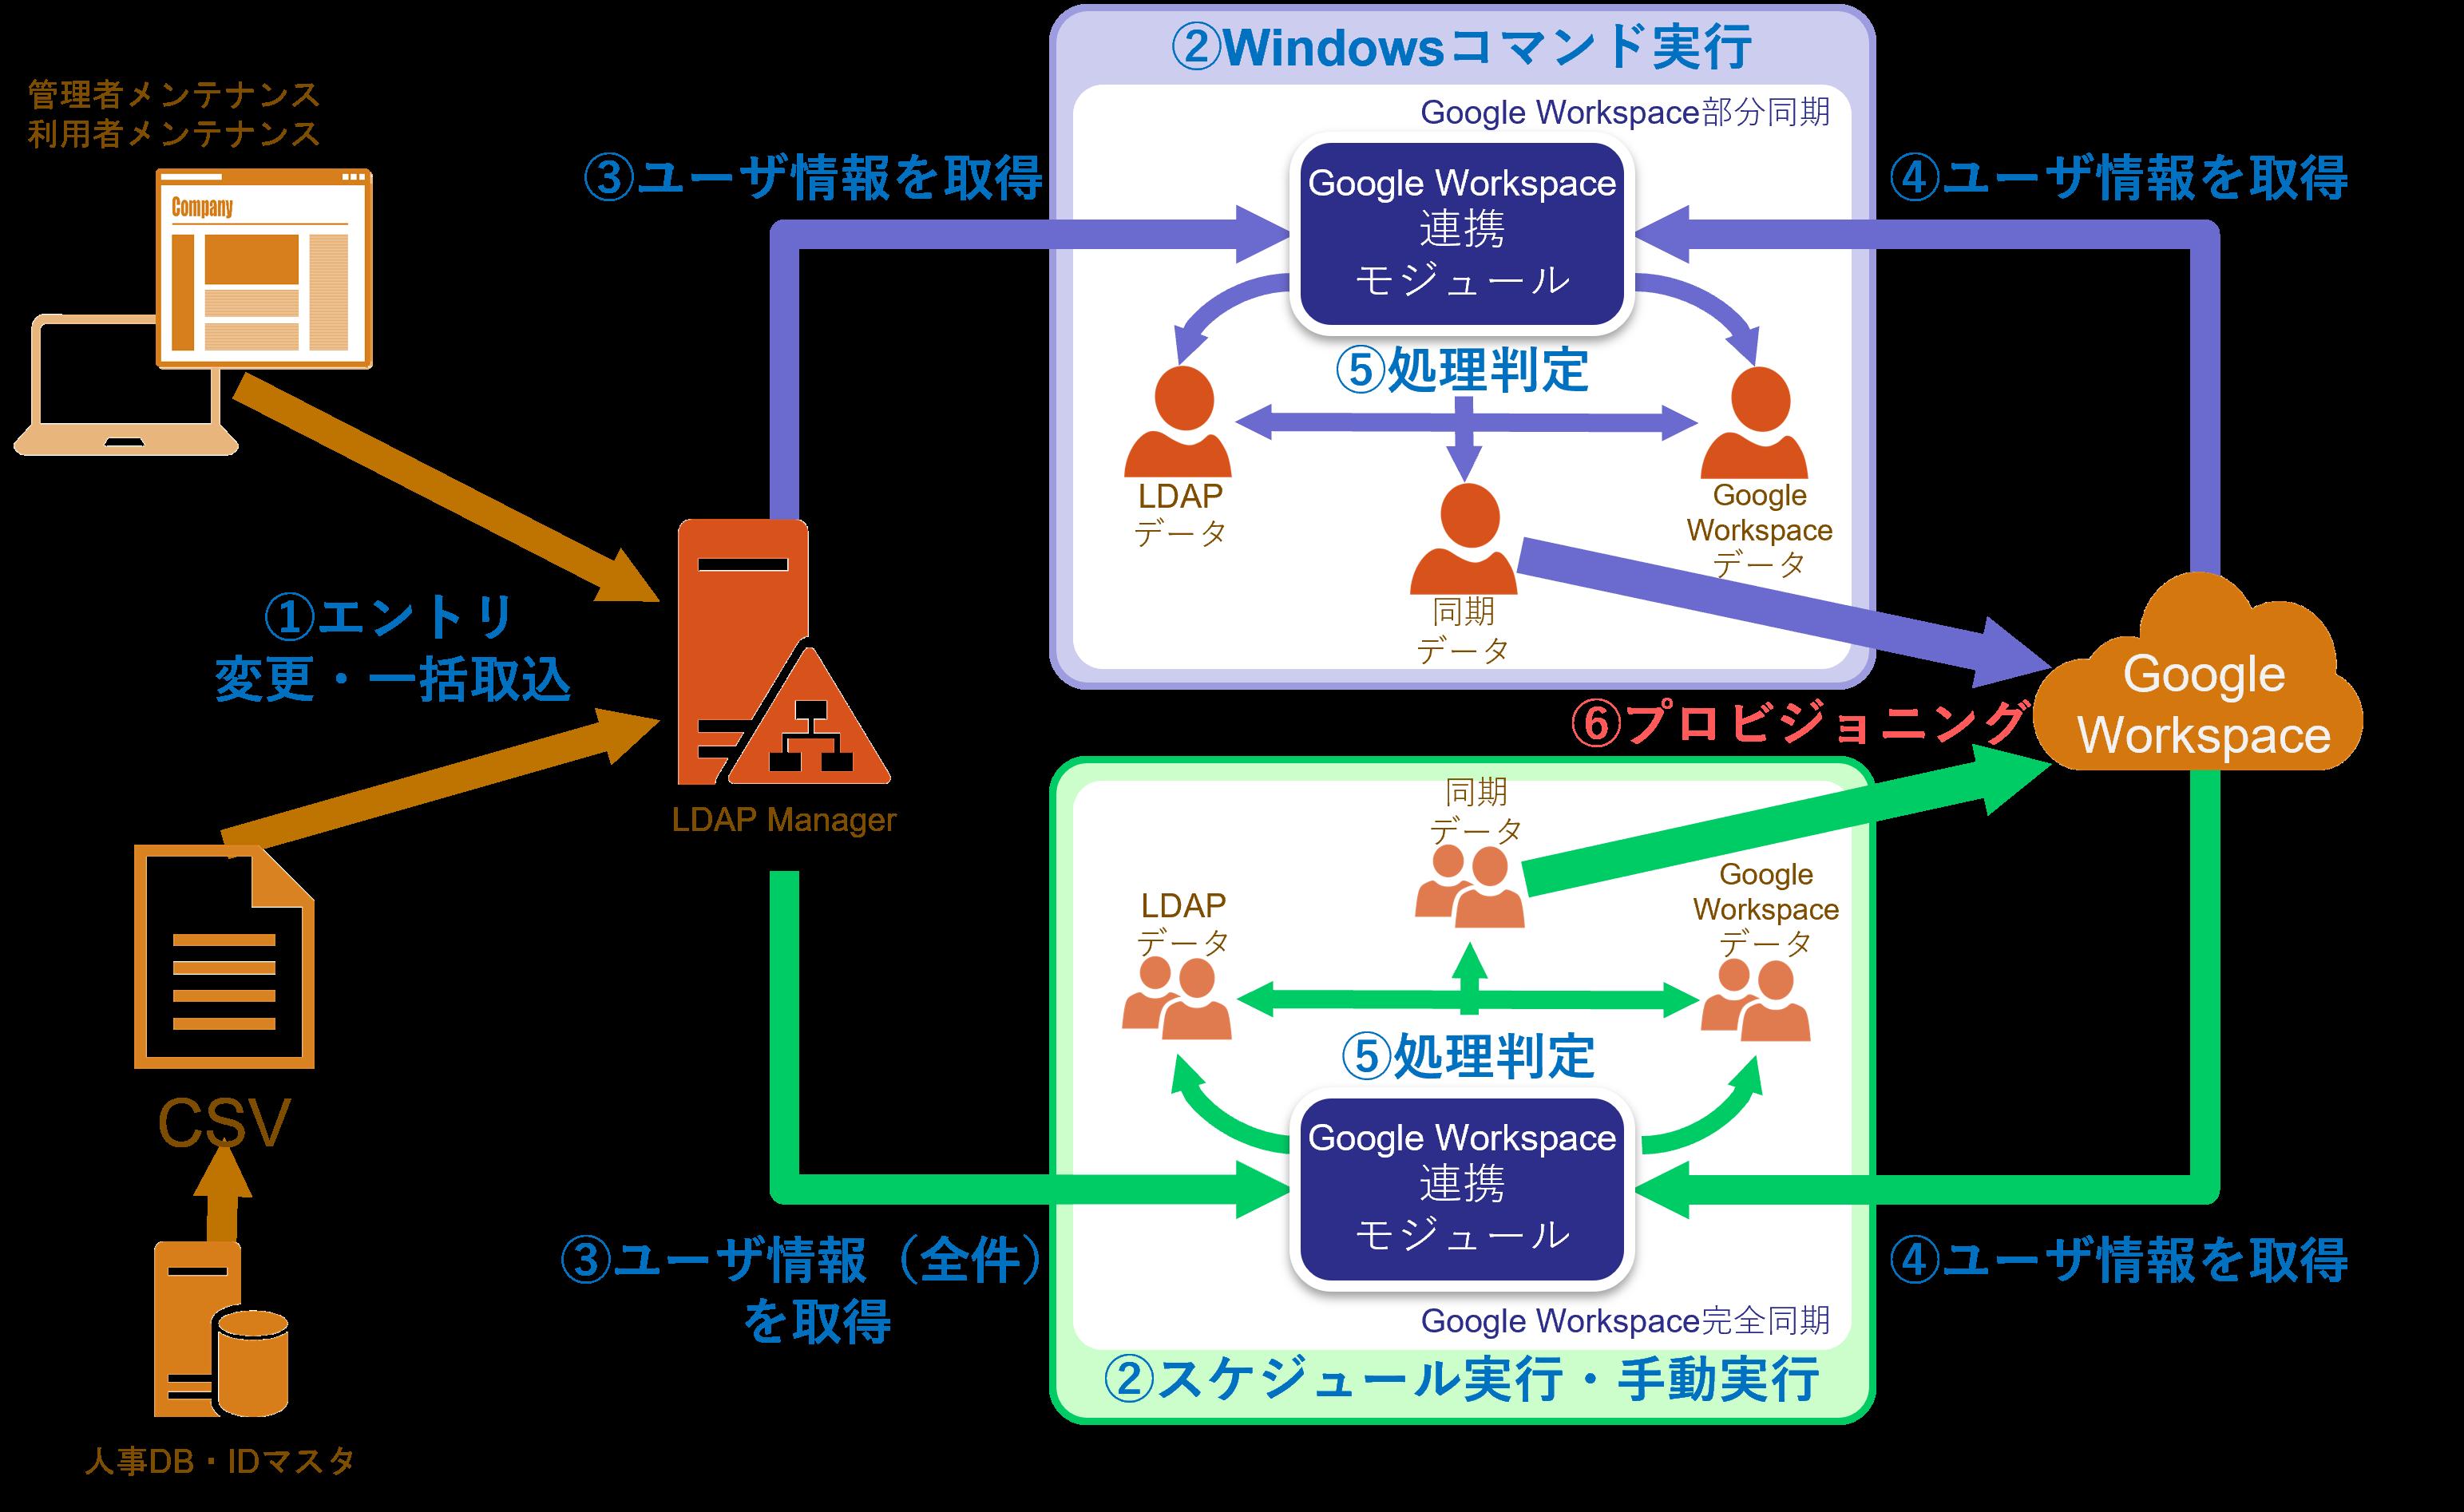 Google Workspace(G Suite)連携モジュール